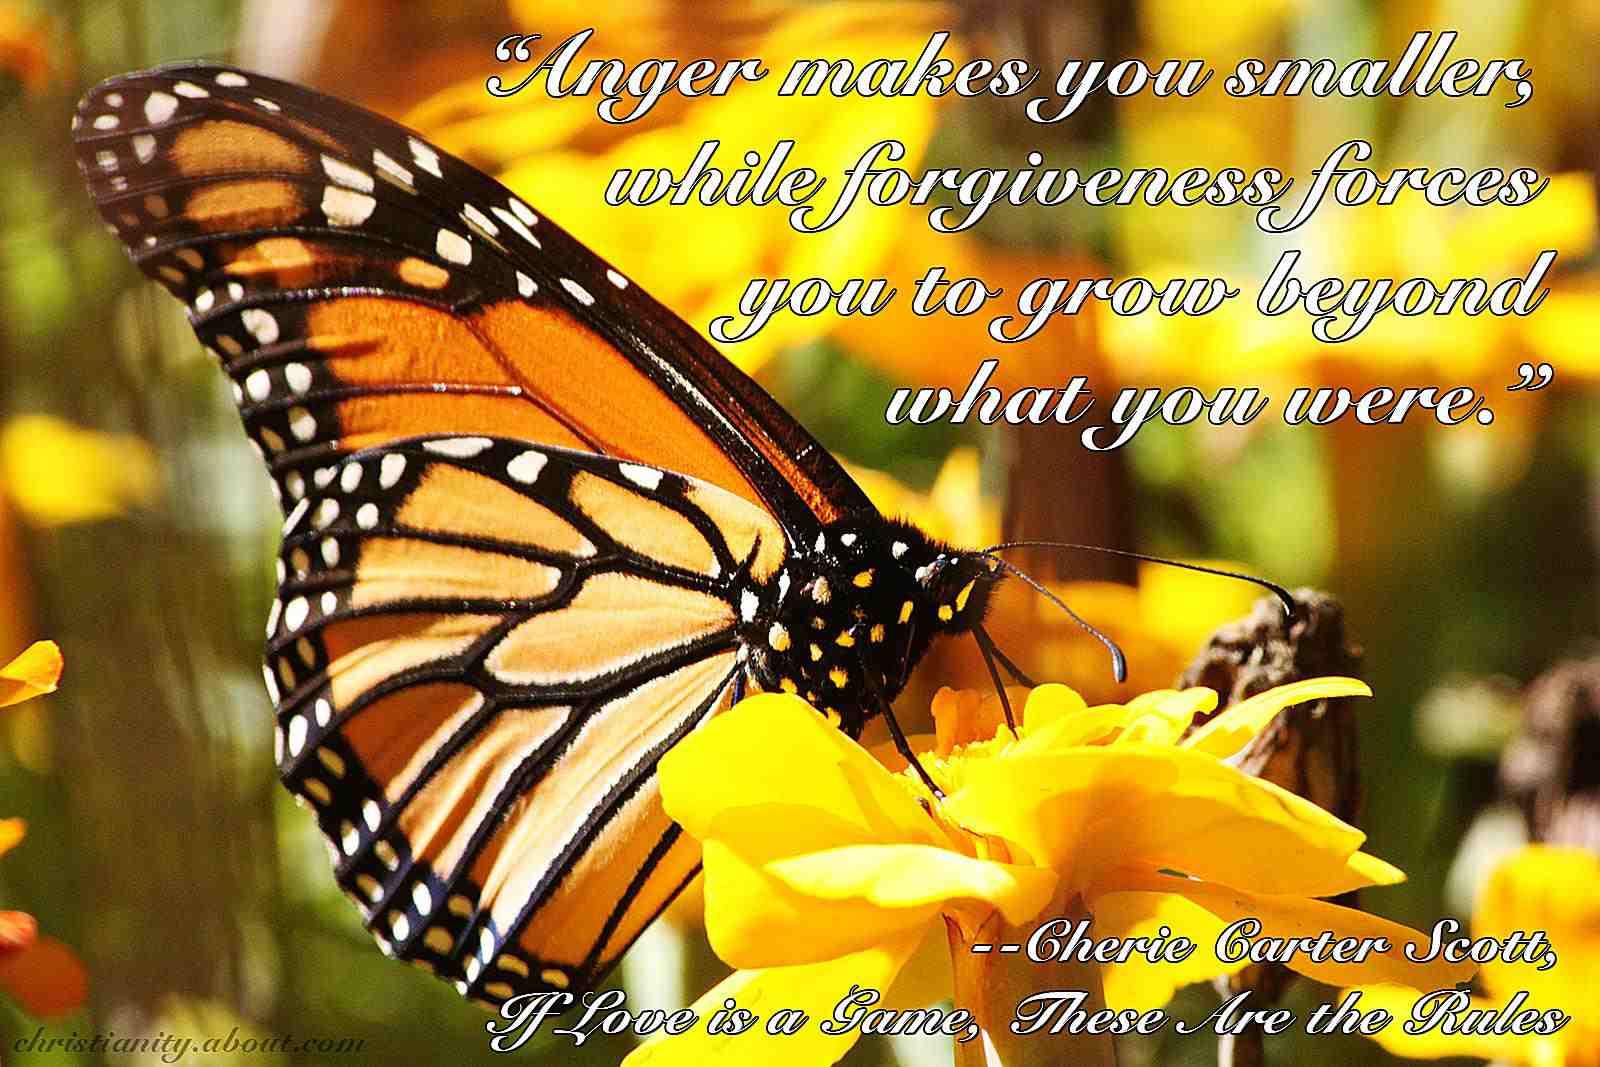 Forgiveness Makes Us Grow